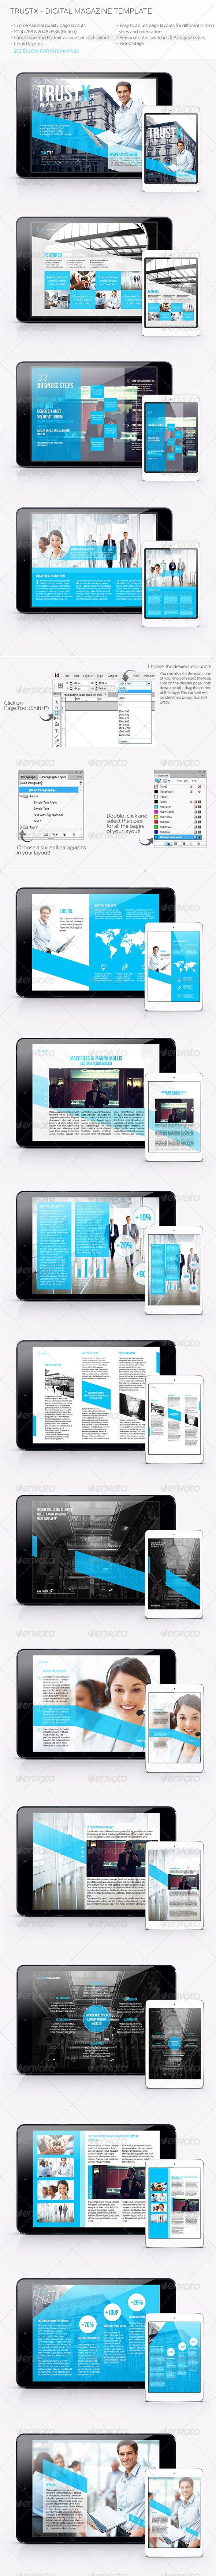 Trustx - Digital Magazine Template http://graphicriver.net/item/trustx-digital-magazine-template/5473781?WT.ac=portfolio_1=portfolio_author=Realstar